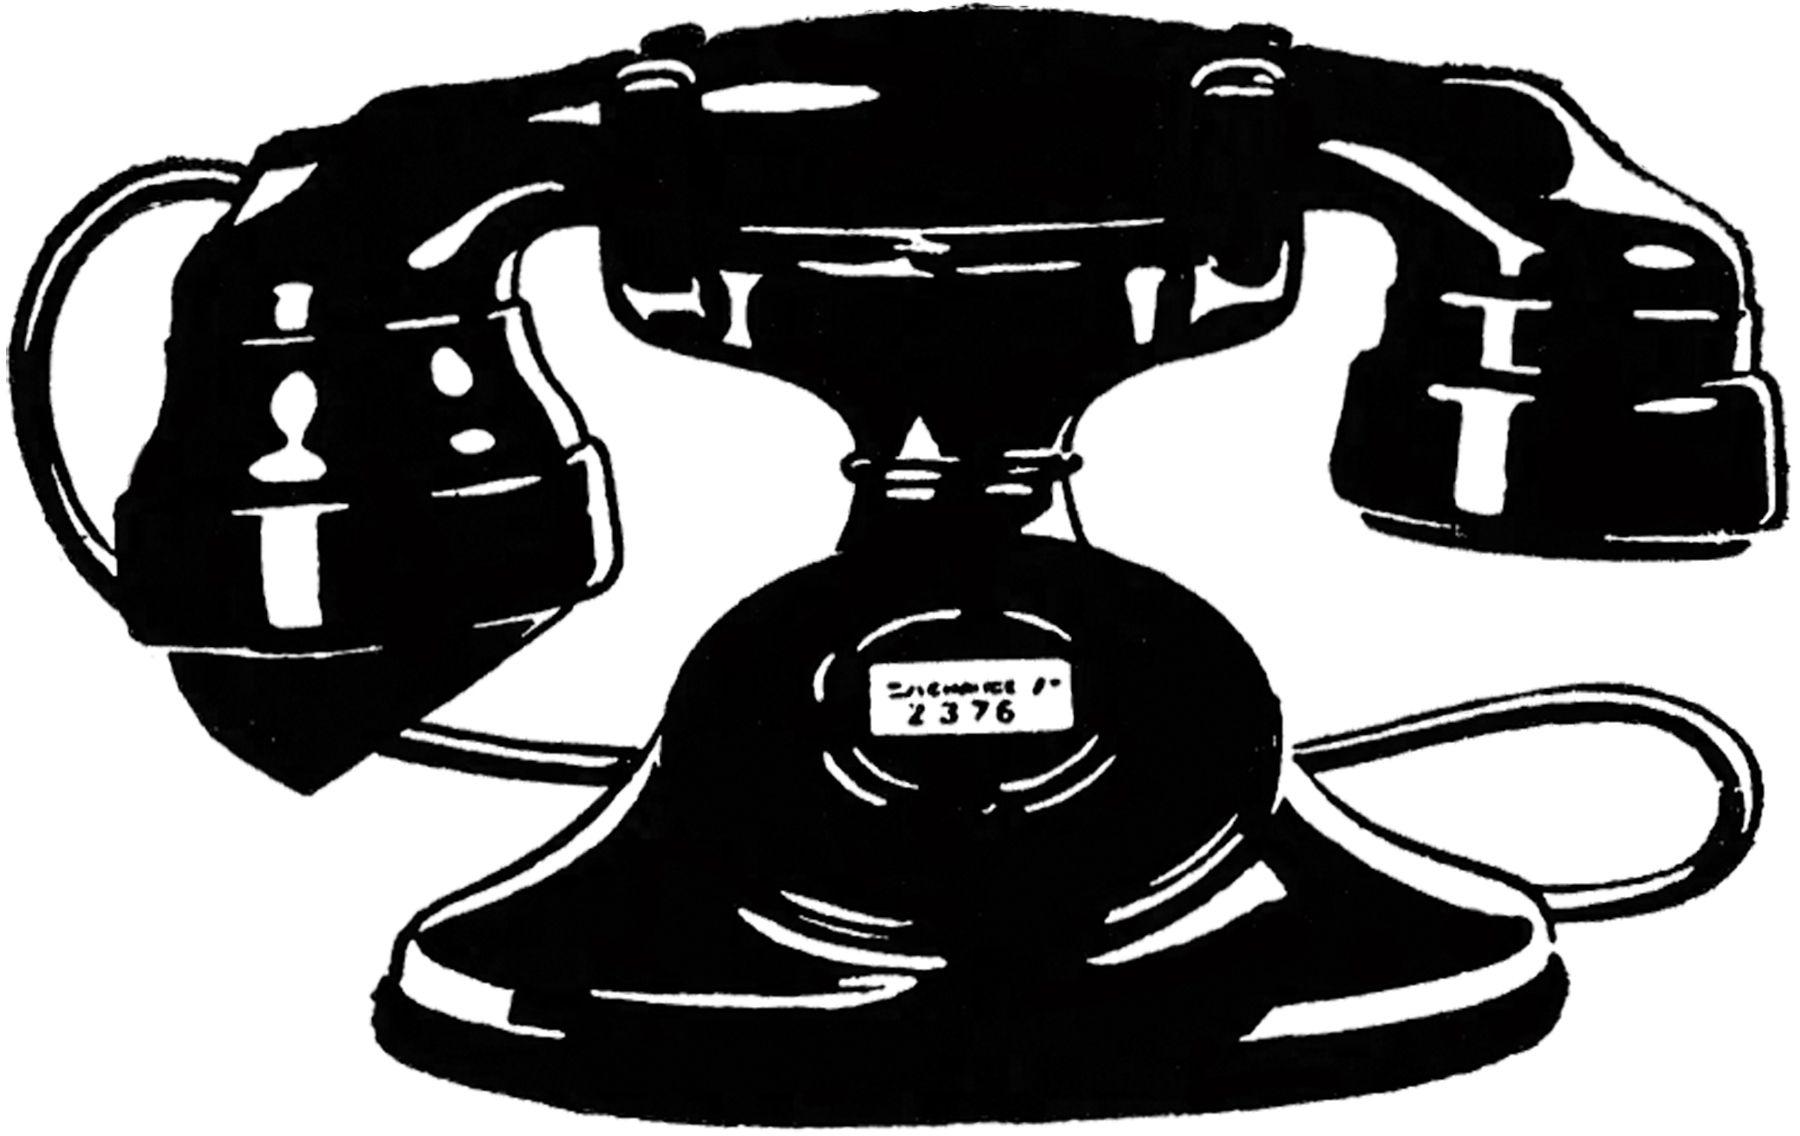 7 Vintage Telephone Images!.